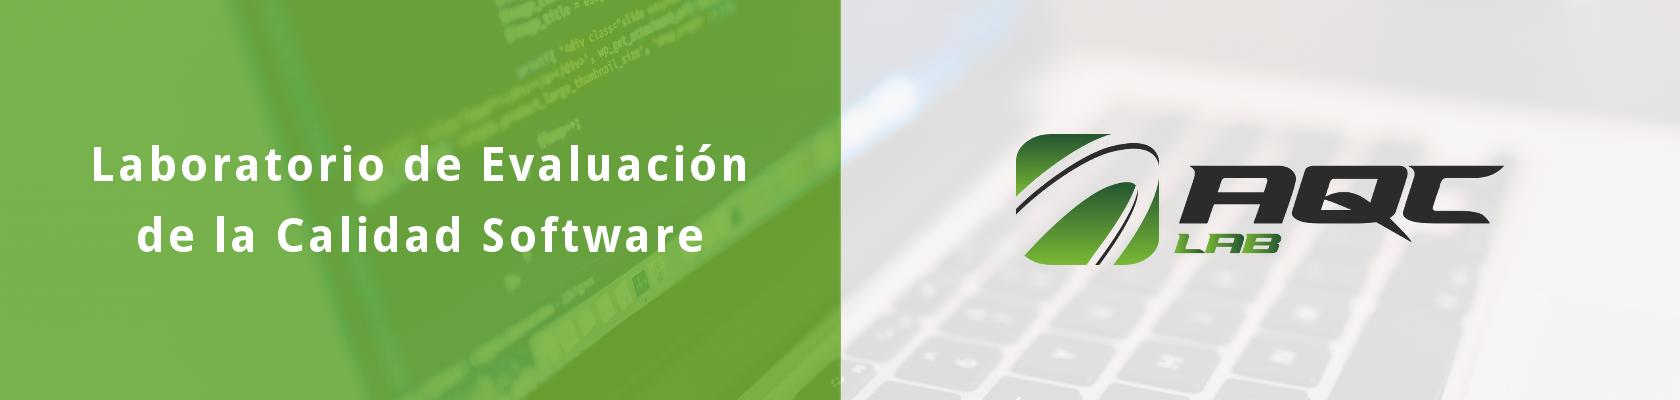 Calidad Software - ISO/IEC 25000